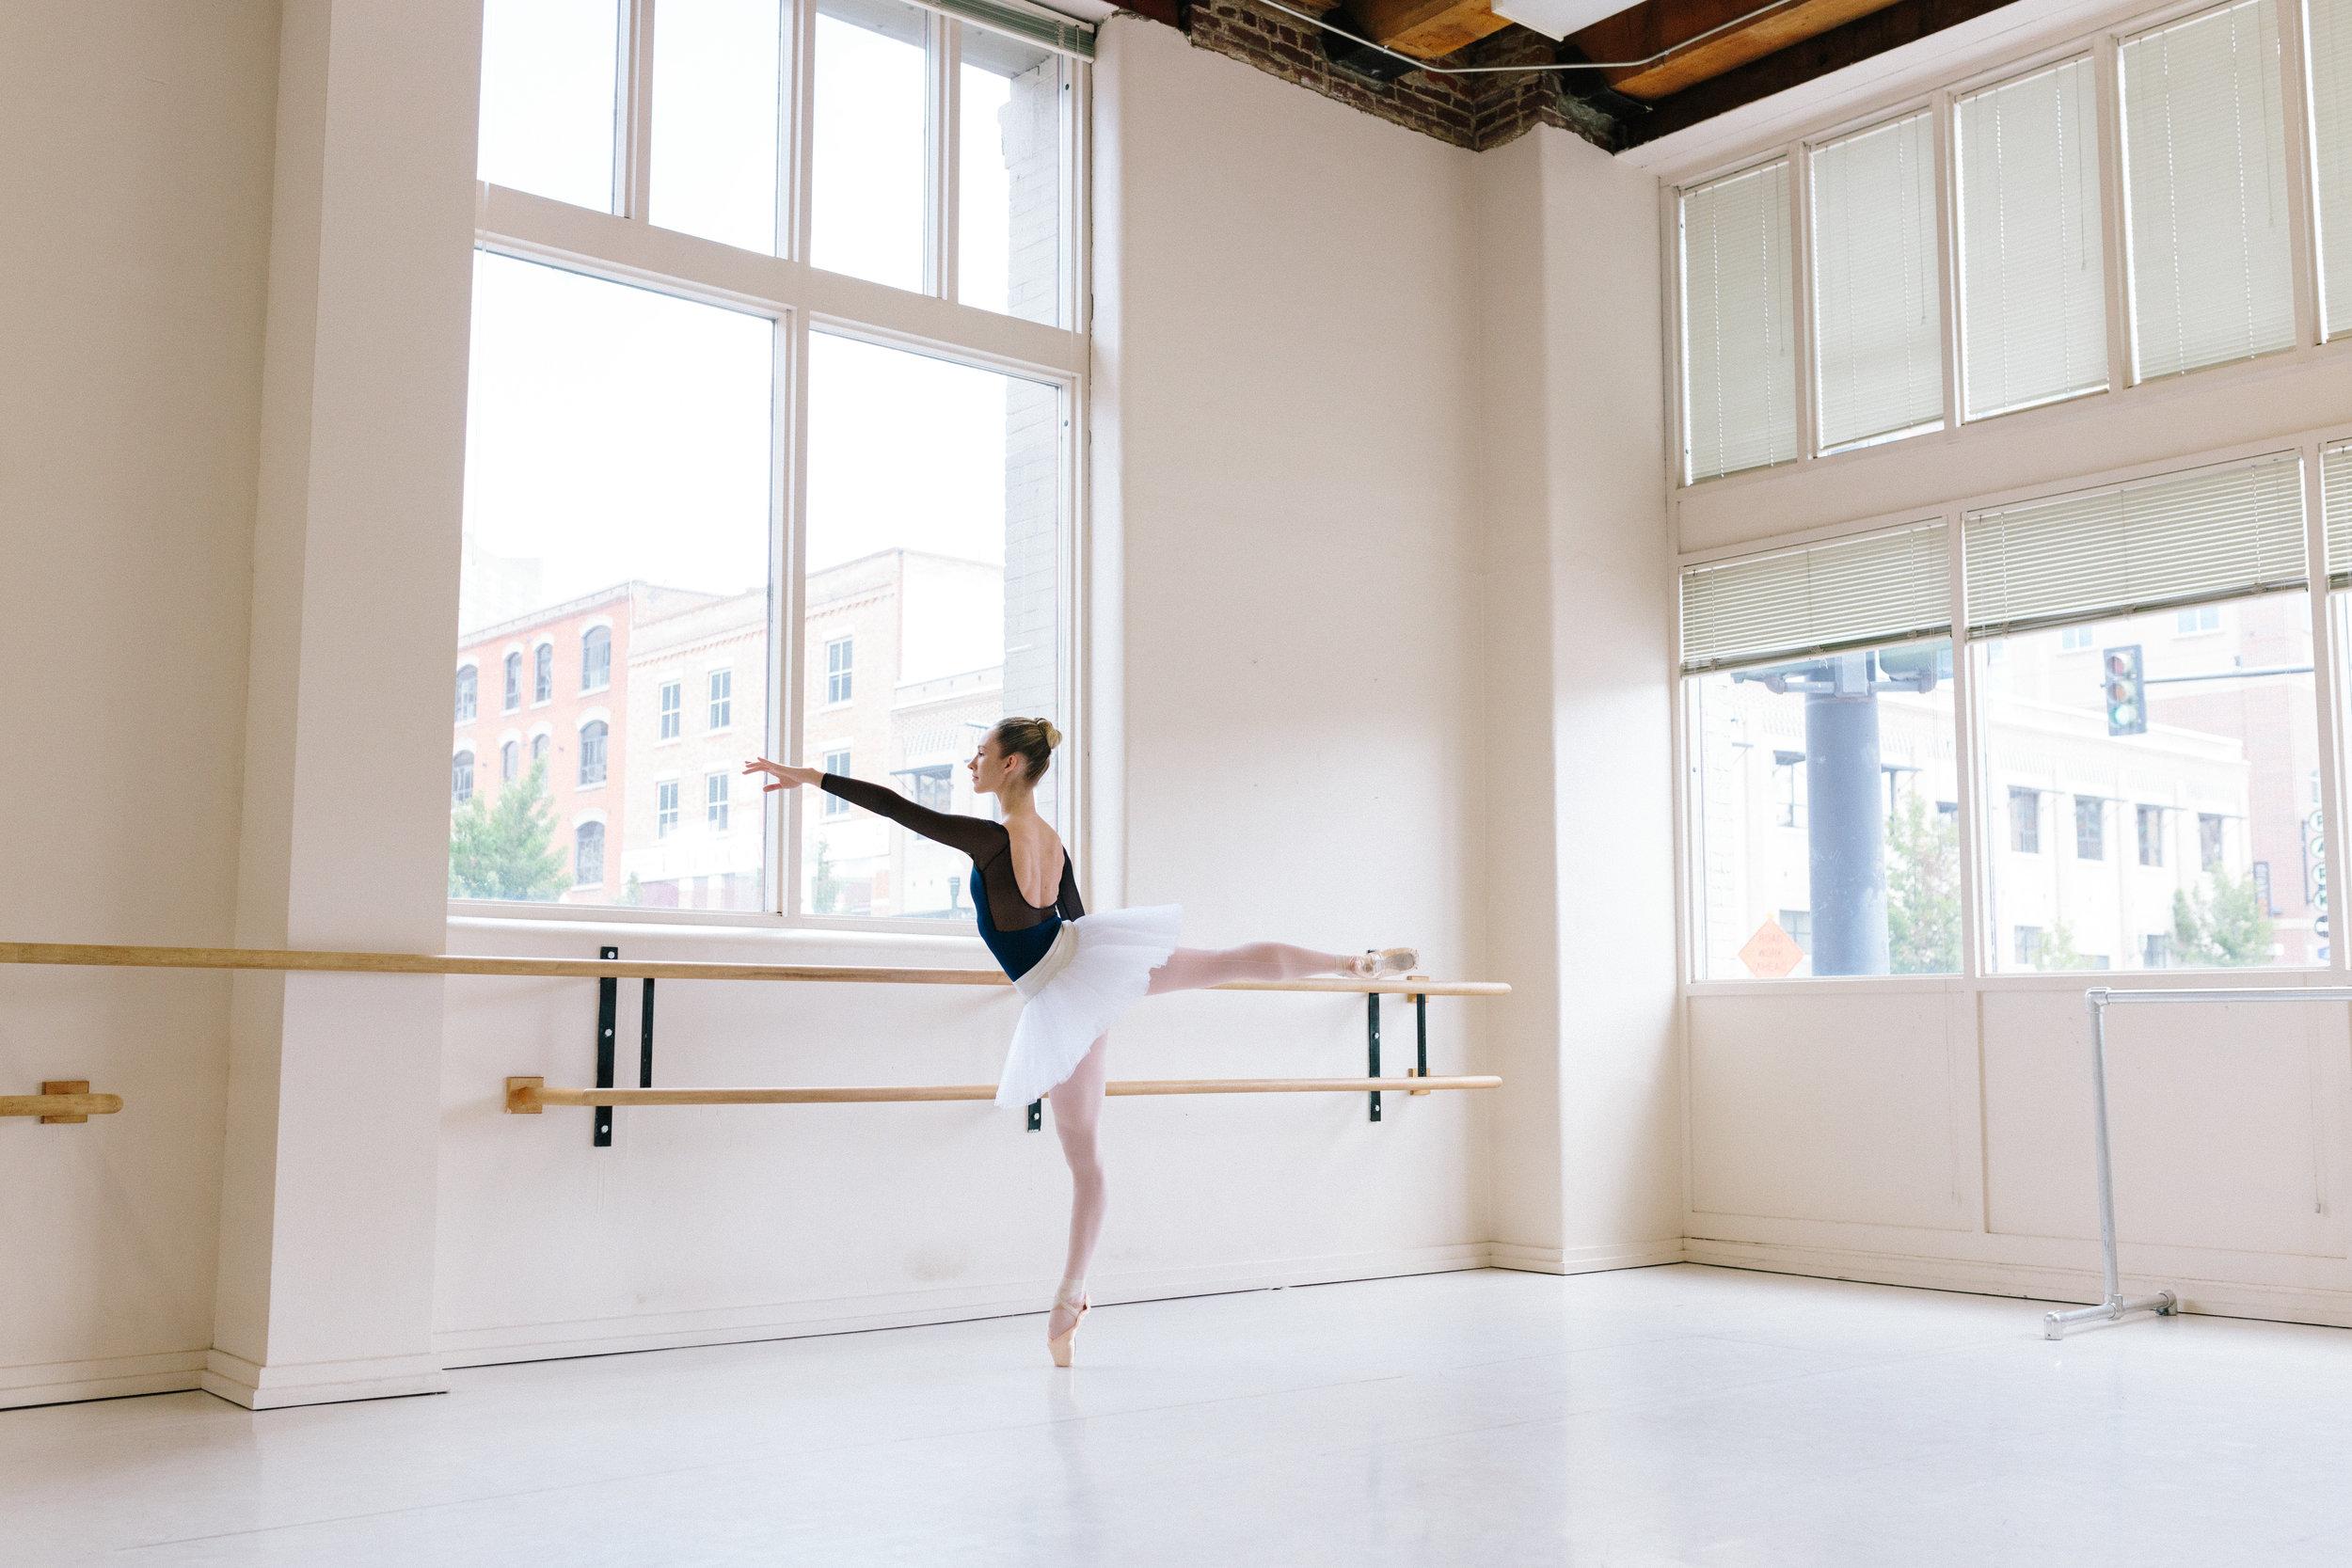 Jessica_Ballet-3.JPG